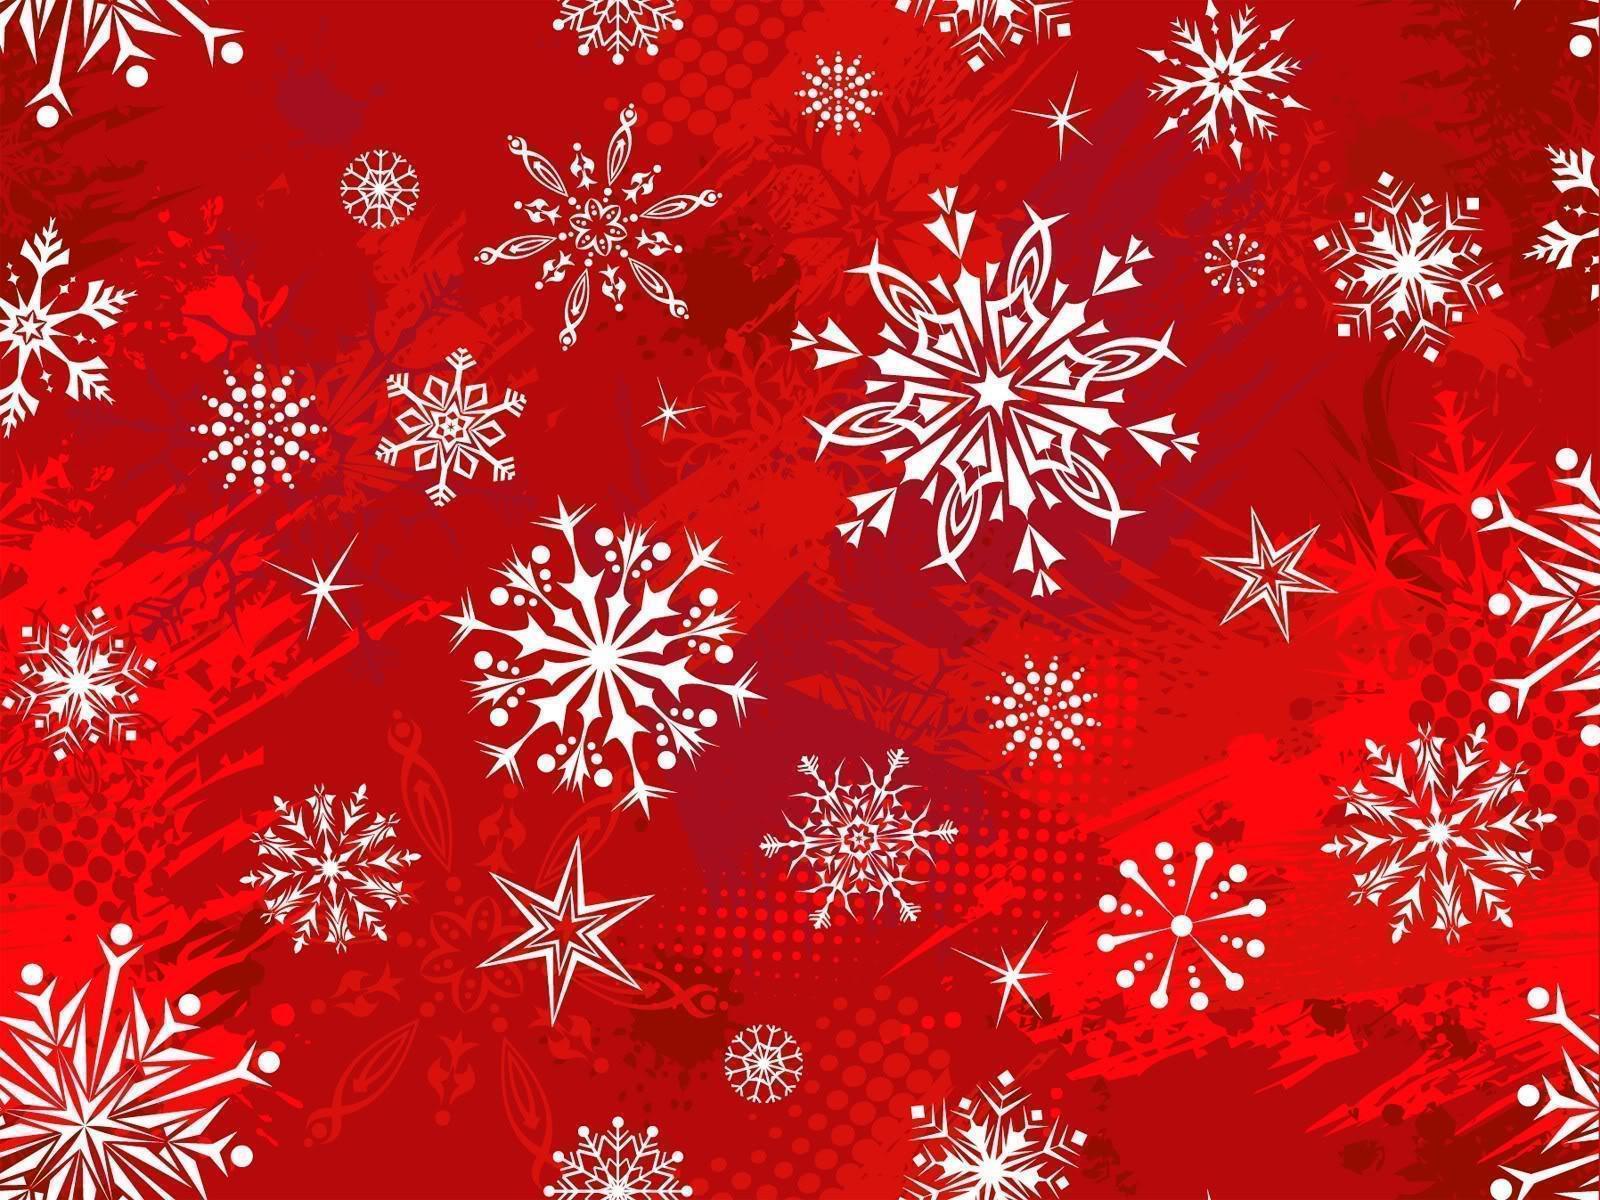 Free christmas wallpaper backgrounds wallpaper cave - Free christmas wallpaper backgrounds ...